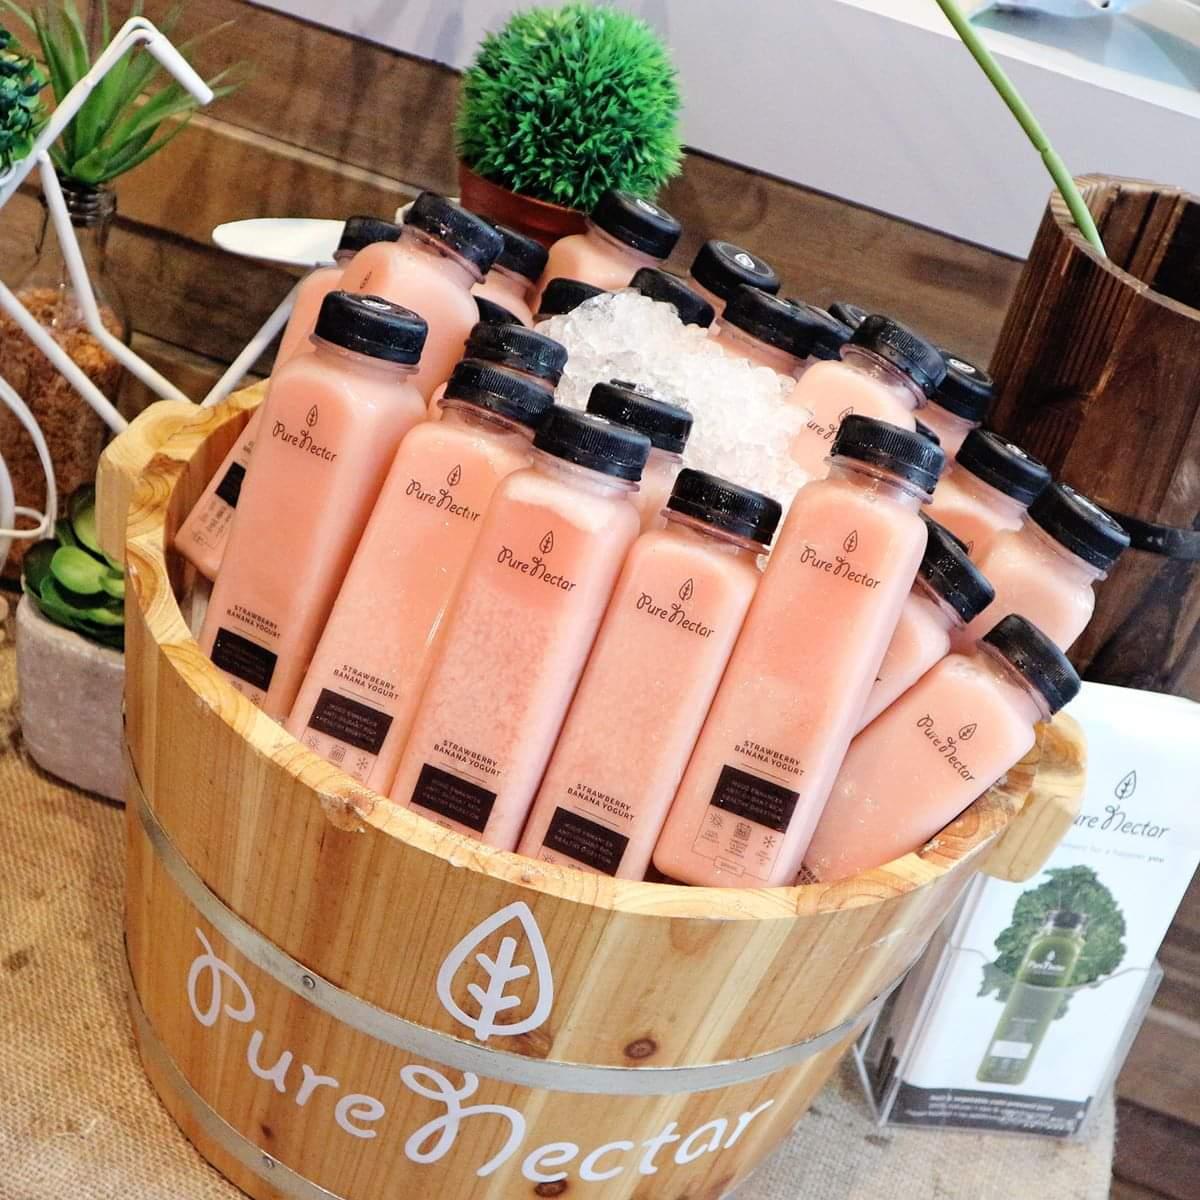 PURE NÉCTAR #smoothies #jugos #prensados #detox #sustentable #franchising #franquicias #entrepreneur #startups fgroupargentina https://t.co/m7lVBHubYJ